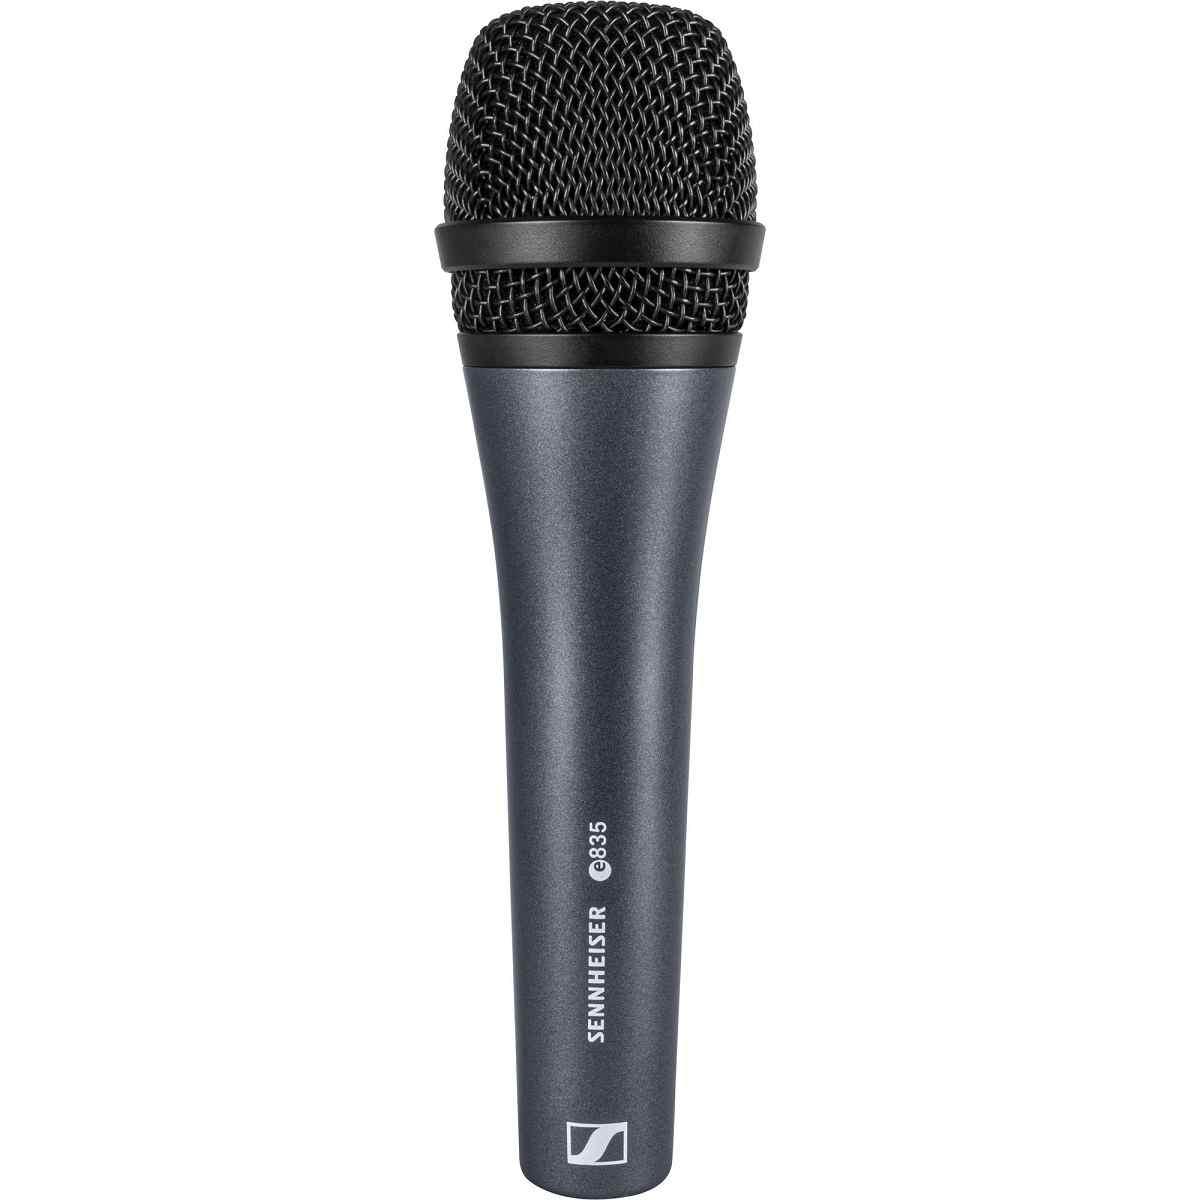 Microfone Dinâmico Cardióide E835 Sennheiser Profissional